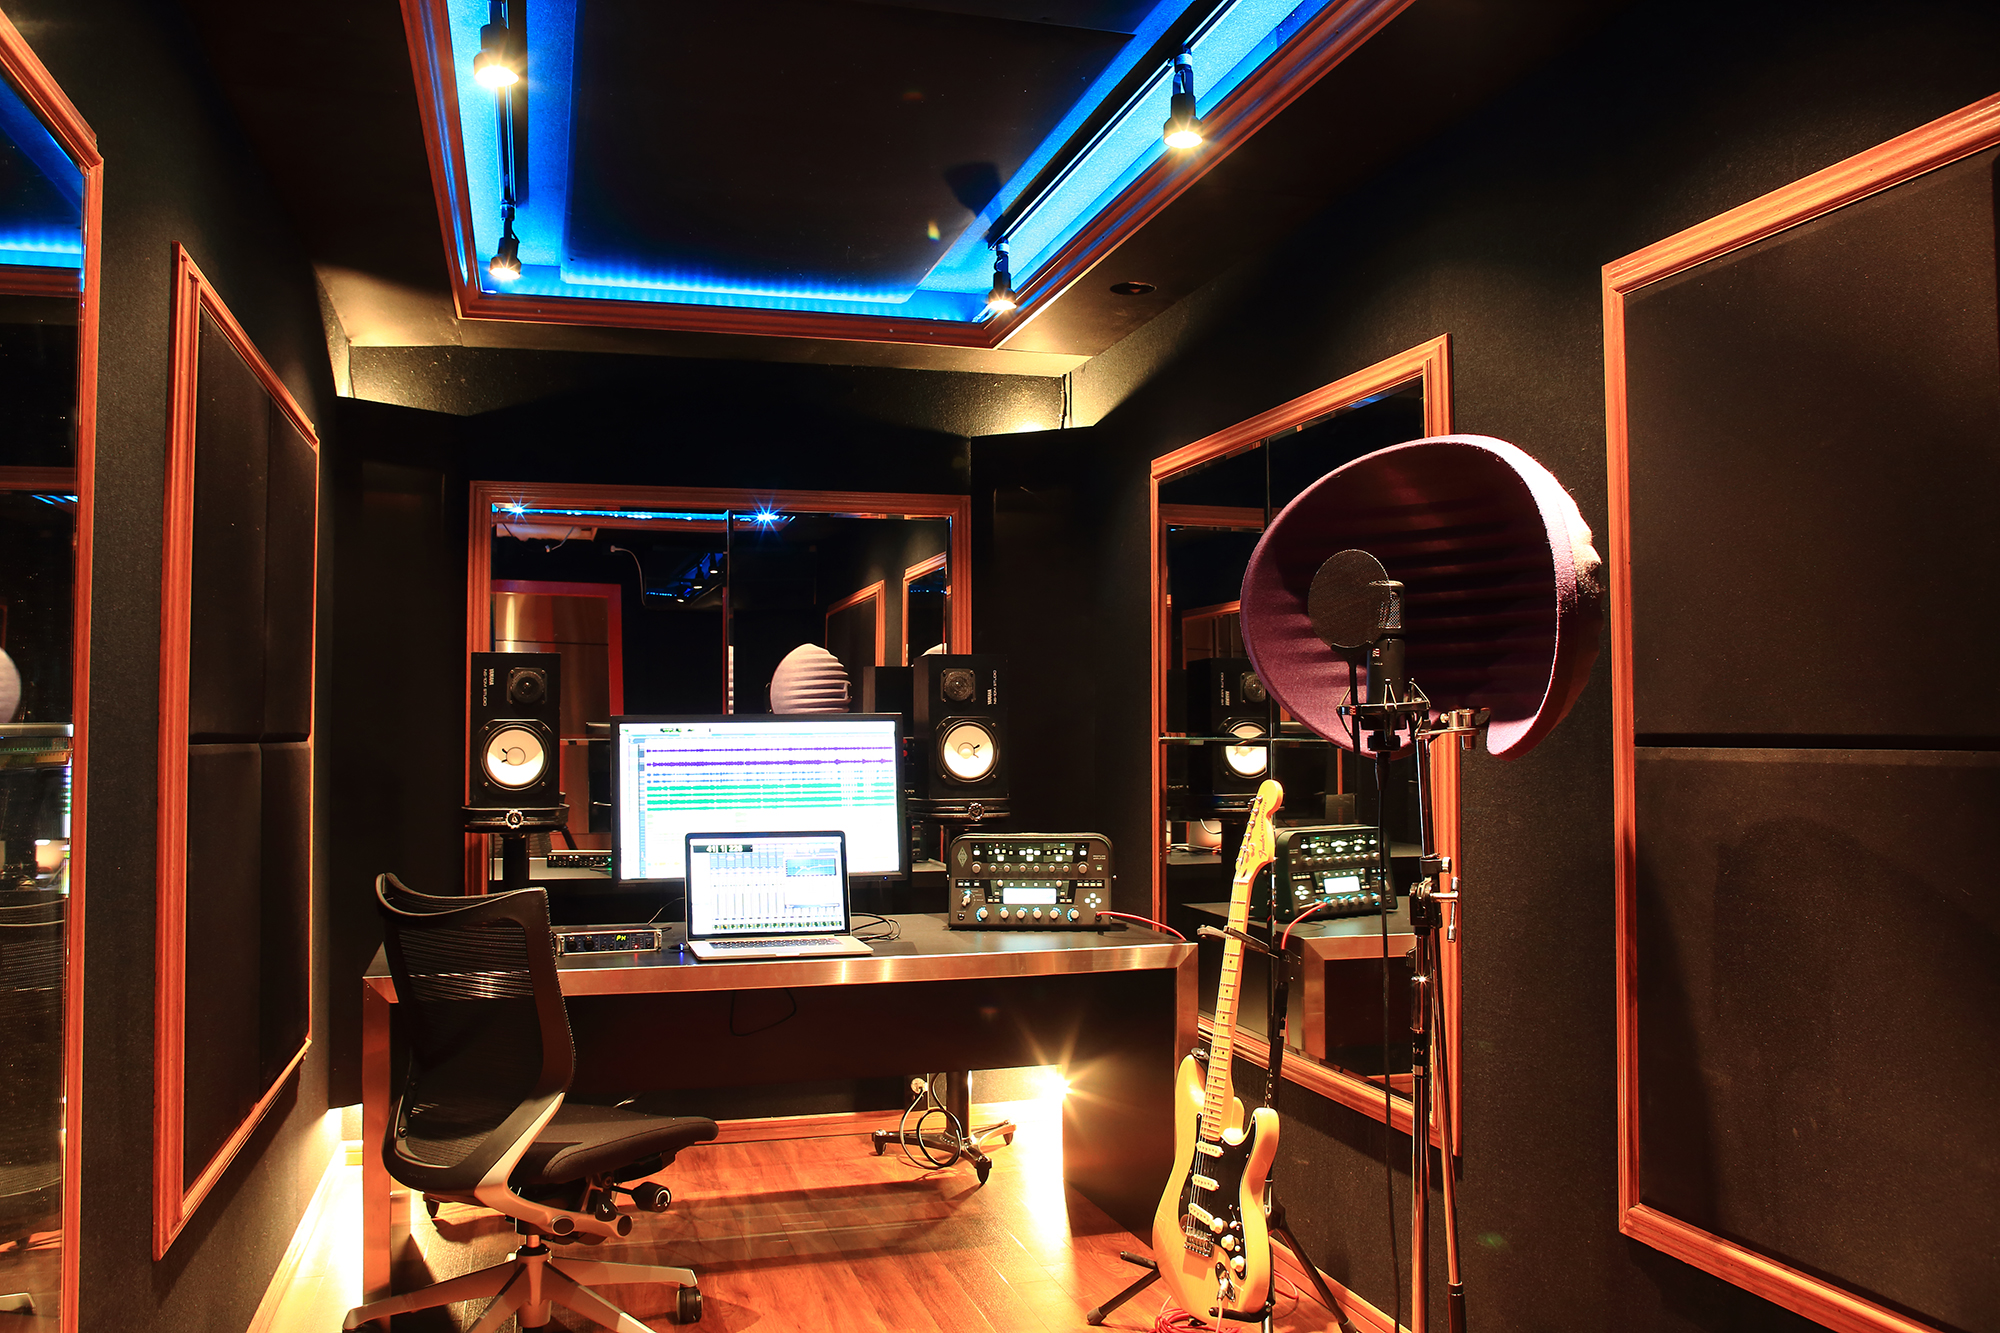 Img 1285 Fix Container Studio Noah Music Game Audio Recording Private Studio コンテナスタジオノア プライベートスタジオ